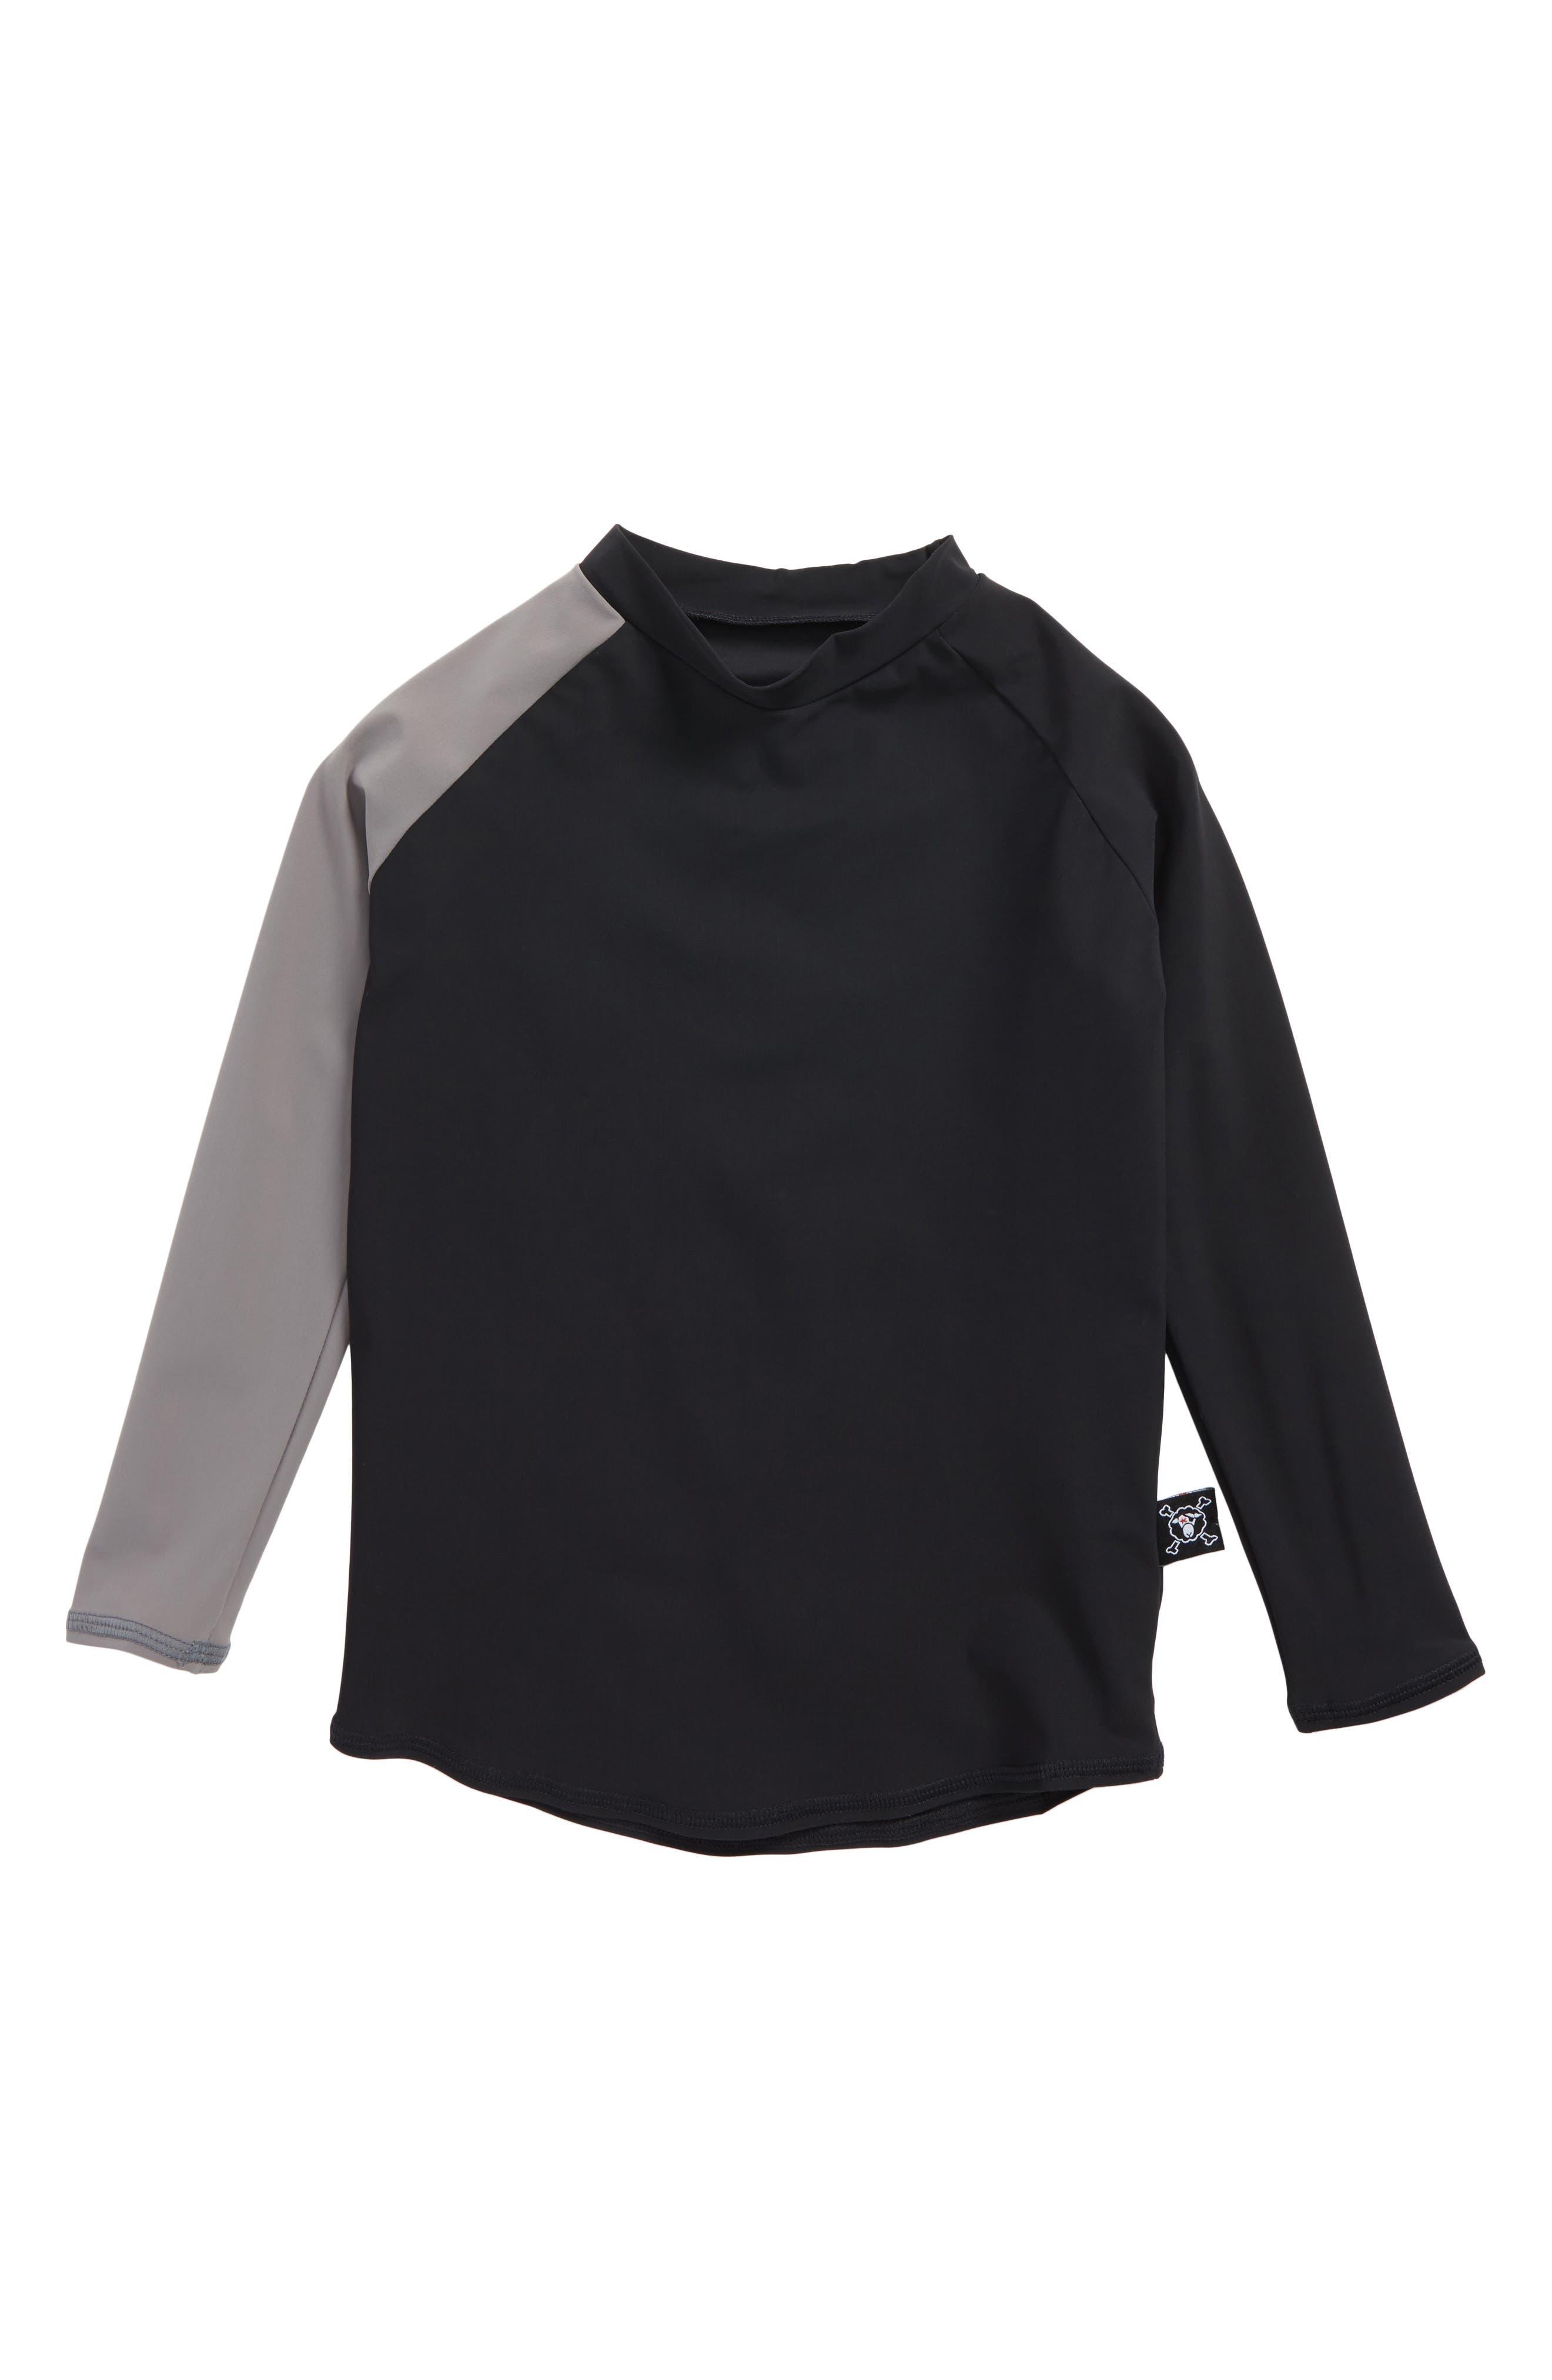 Long Sleeve Rashguard,                             Main thumbnail 1, color,                             Black/ Dark Grey